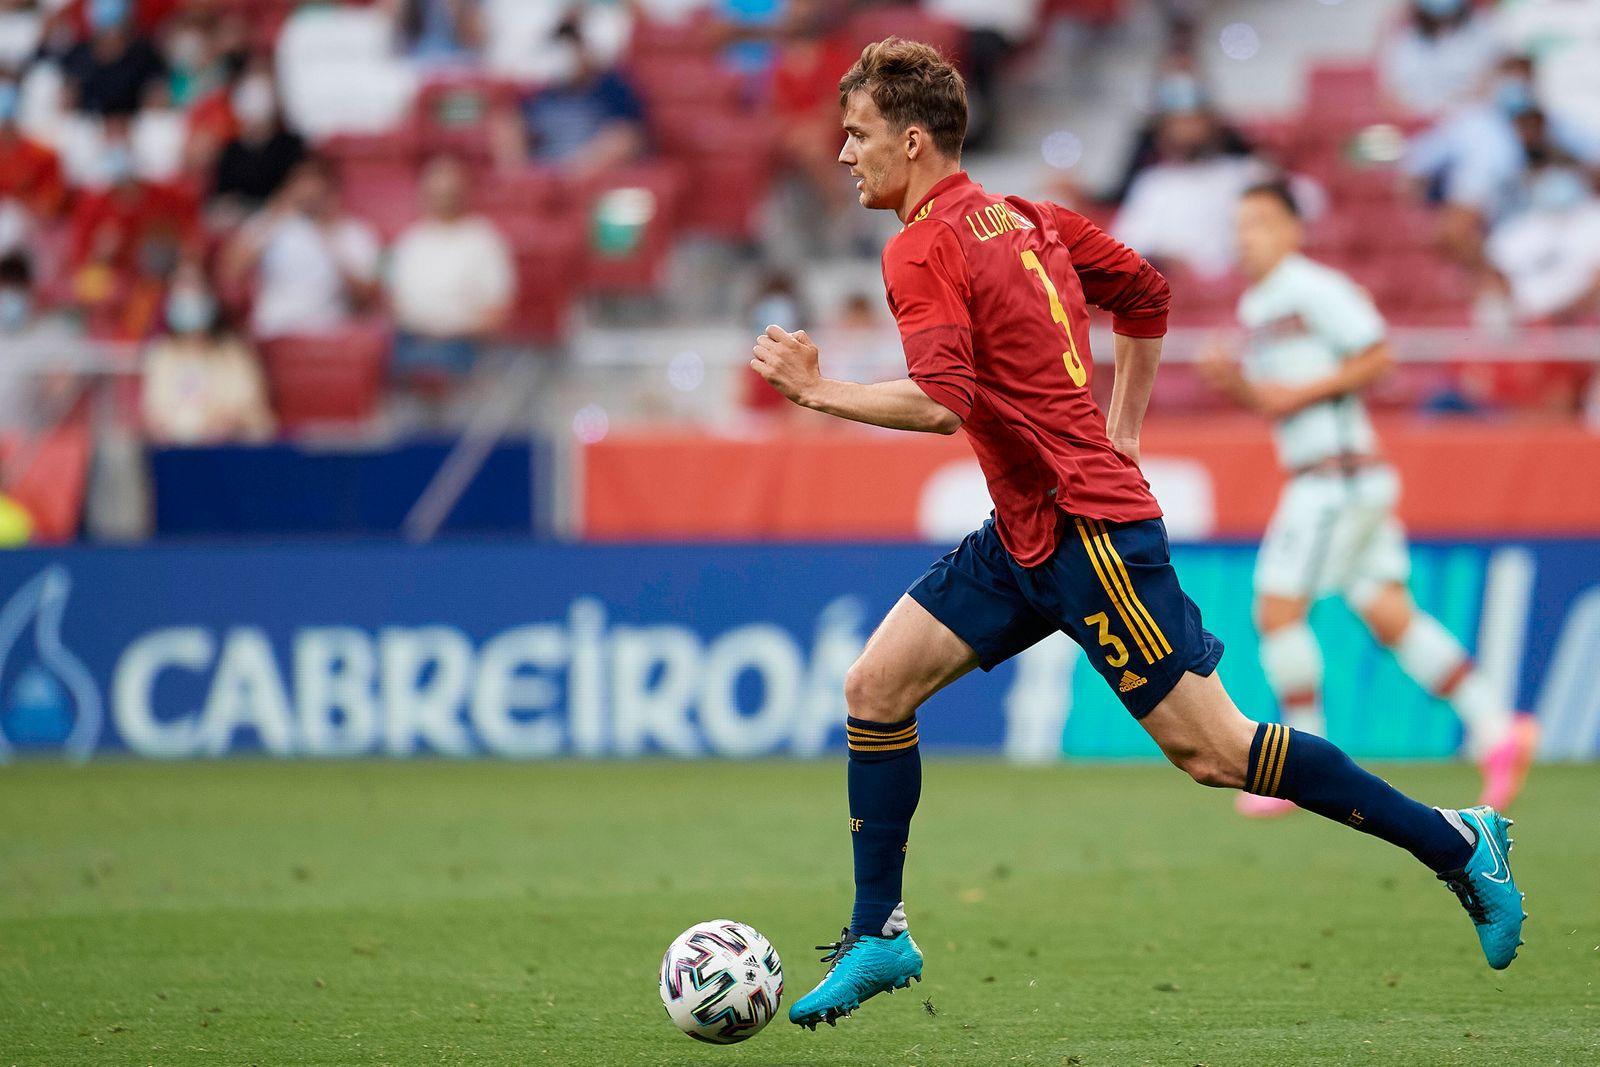 Spain v Portugal - International Friendly, Länderspiel, Nationalmannschaft Diego Llorente (Leeds United) of Spain runs w